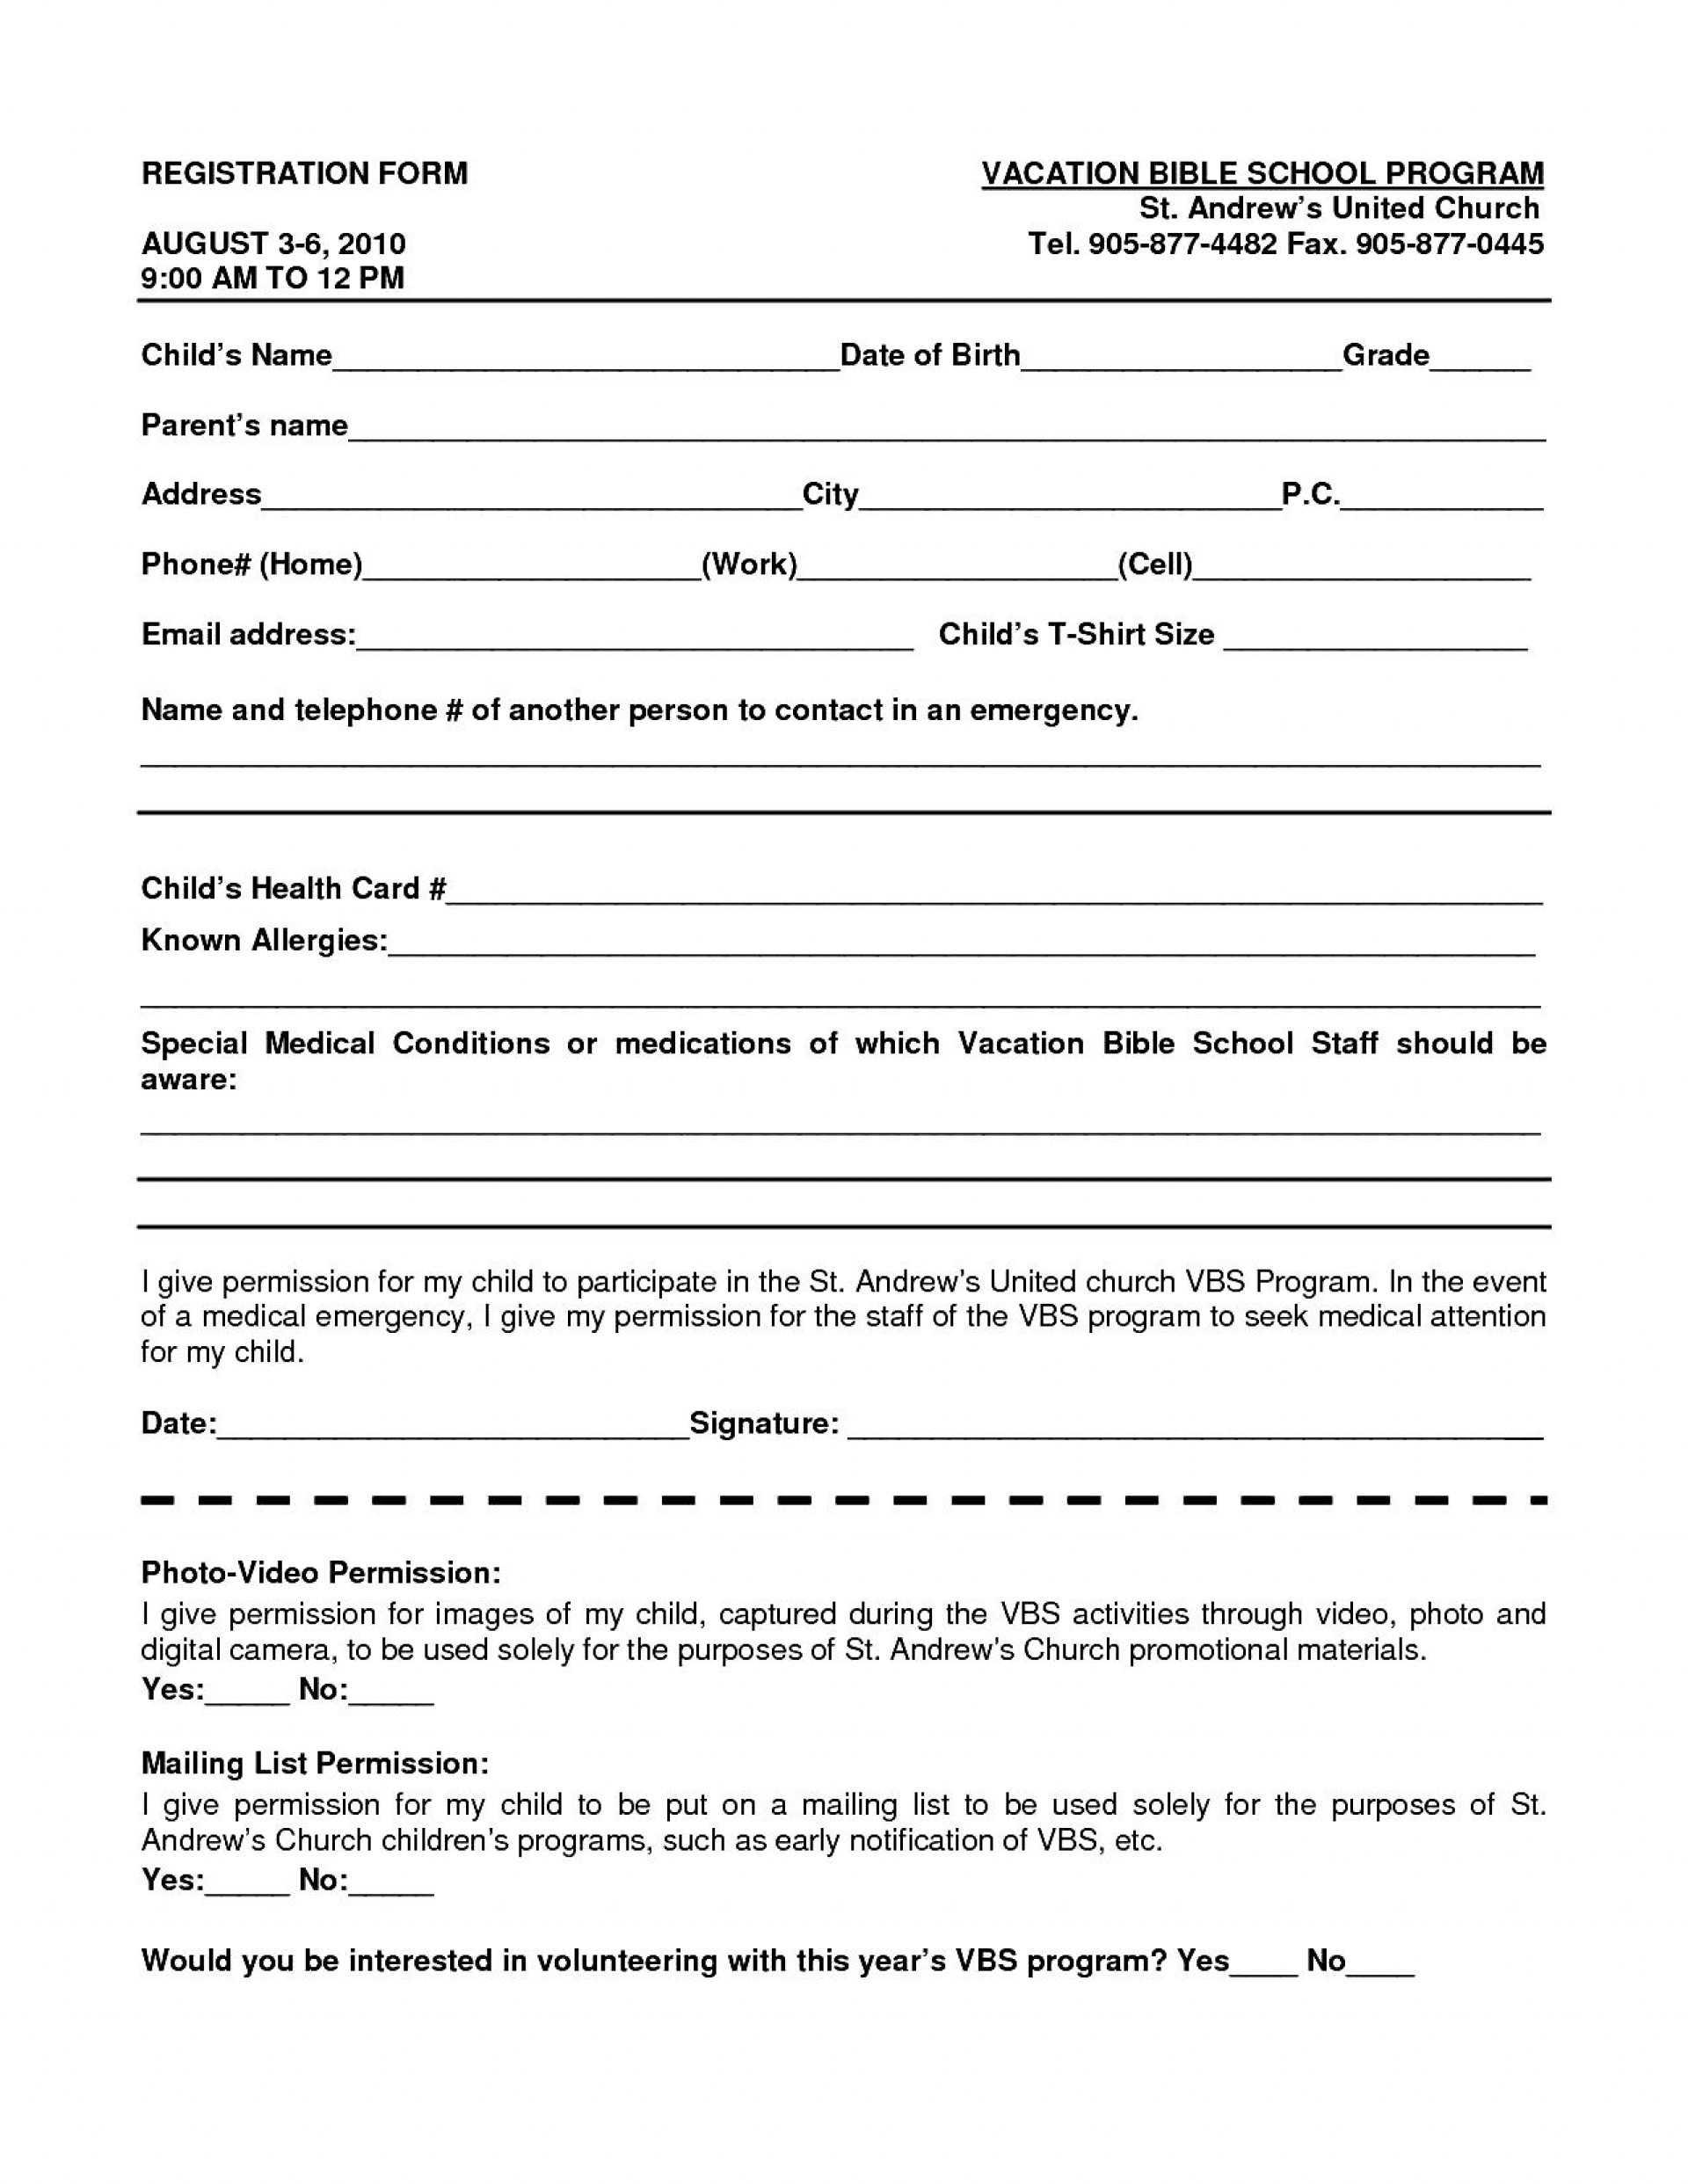 016 School Registration Form Template Word Ideas Free In Throughout School Registration Form Template Word